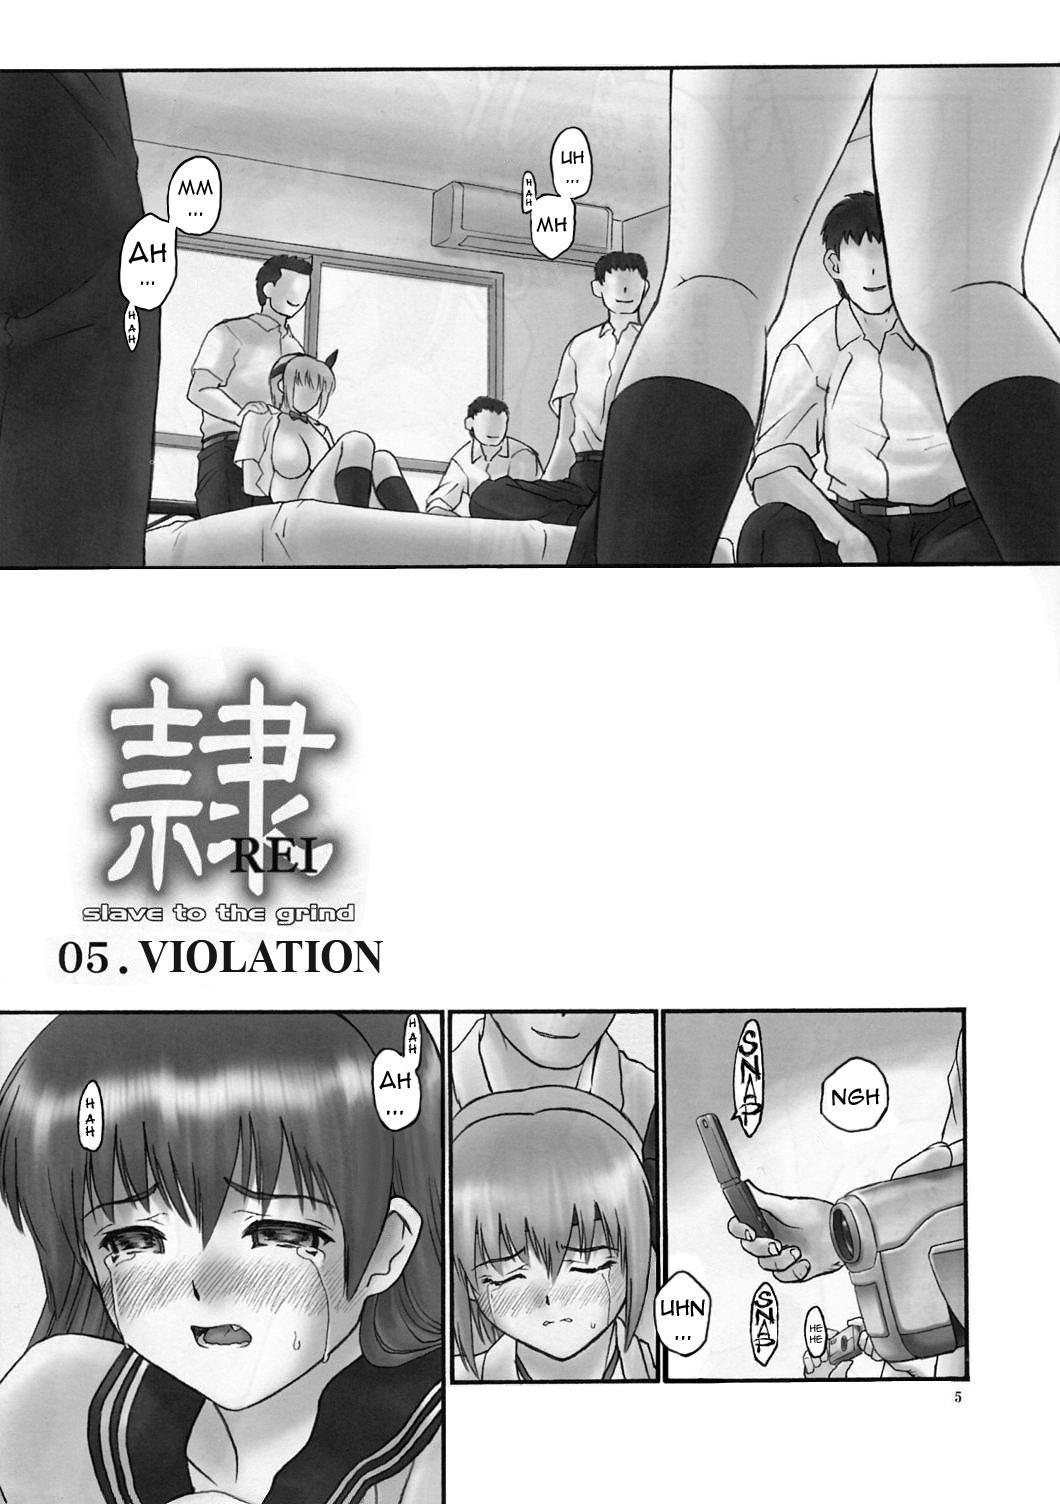 (C72) [Hellabunna (Iruma Kamiri)] REI - slave to the grind - CHAPTER 04: SURGE (Dead or Alive) [English] [Kletian] 3